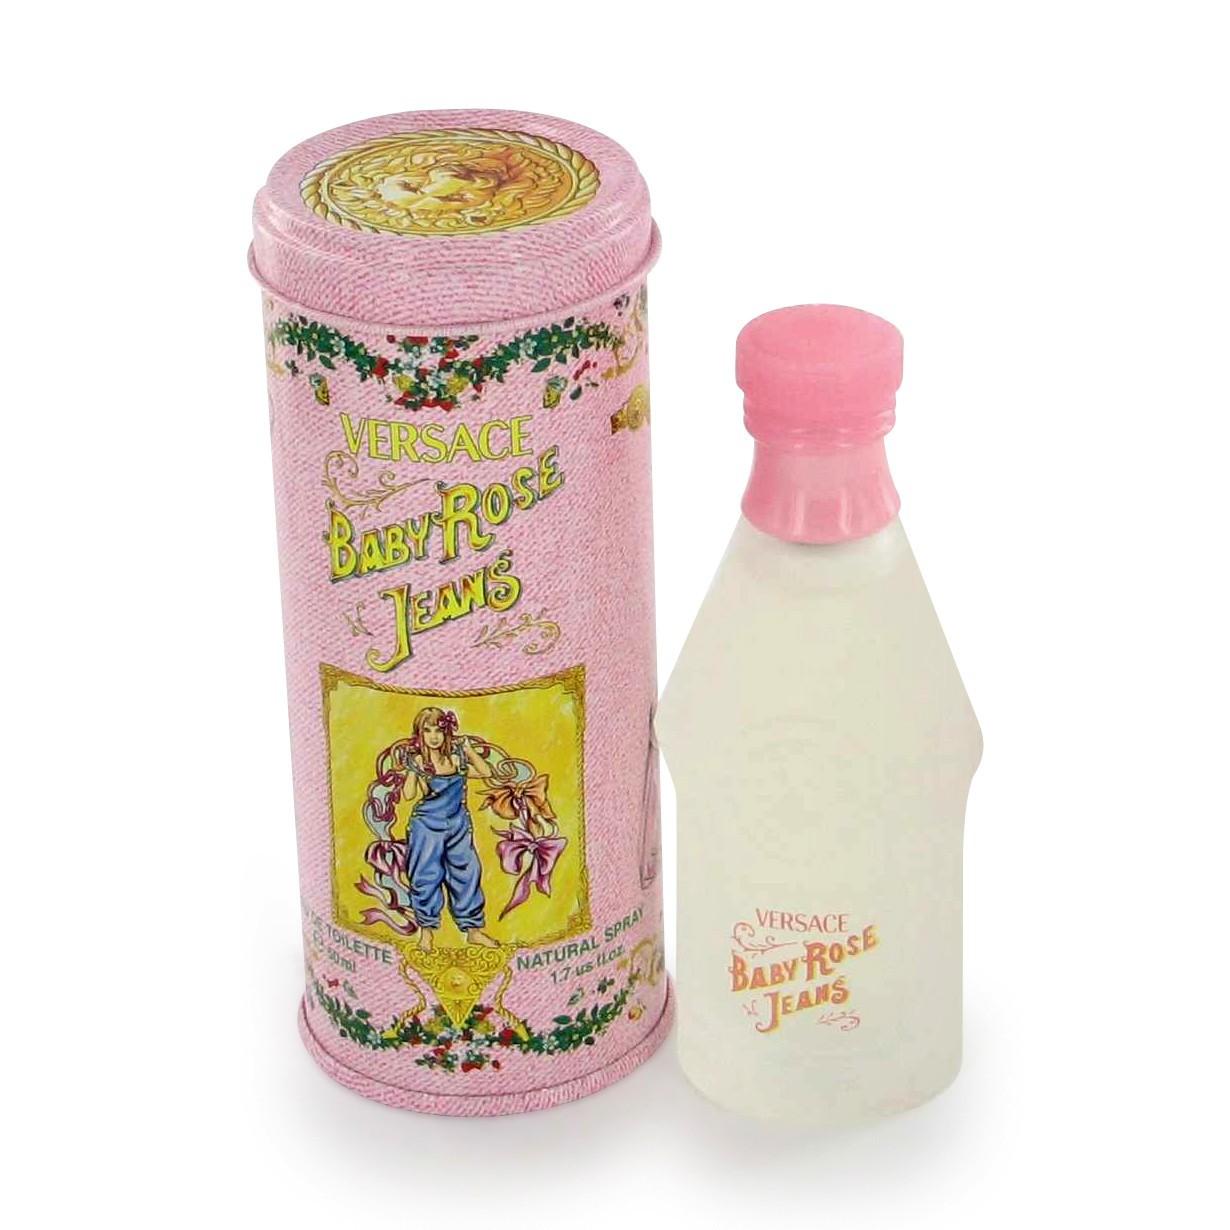 Versace Baby Rose Jeans аромат для девочек